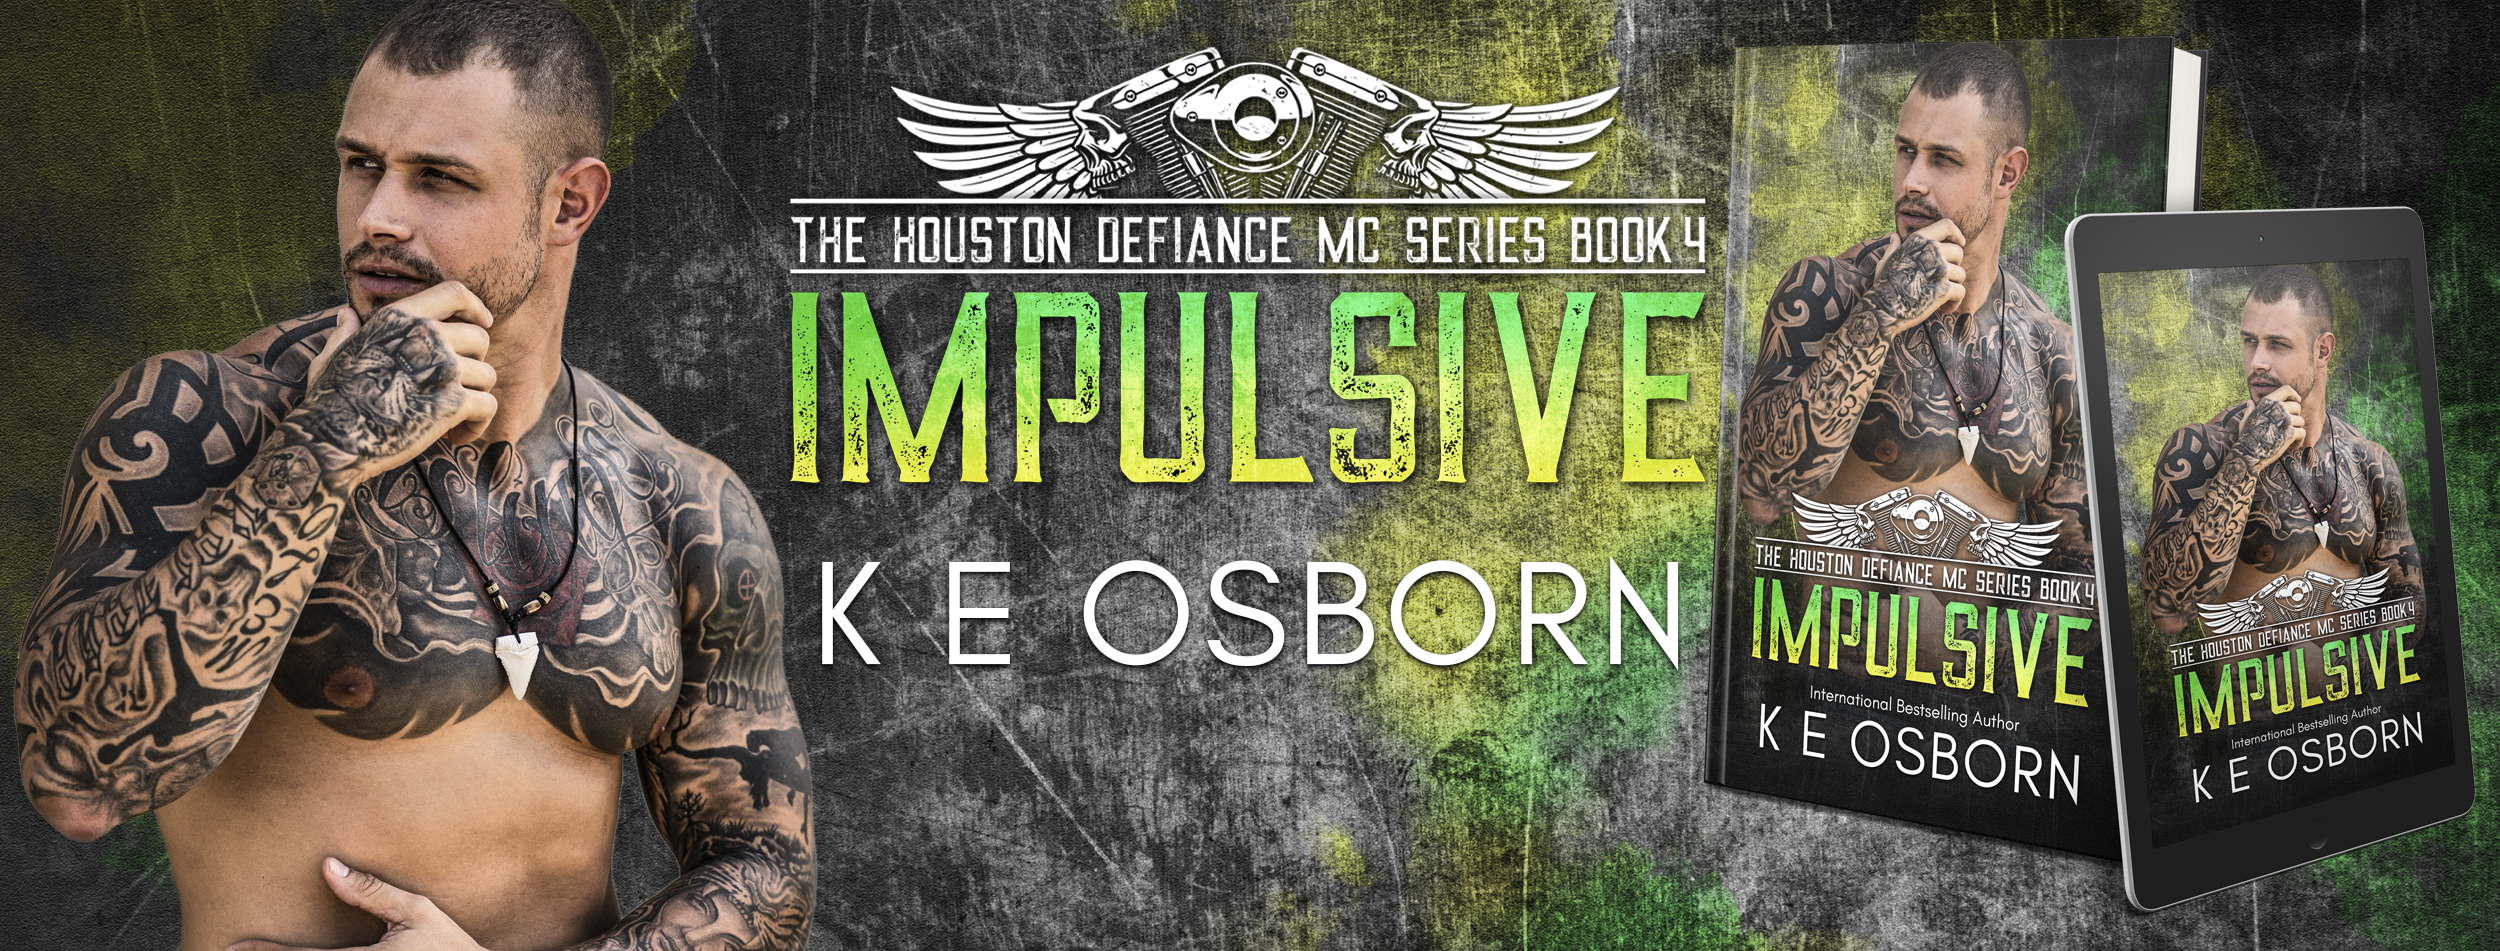 Impulsive banner (1)